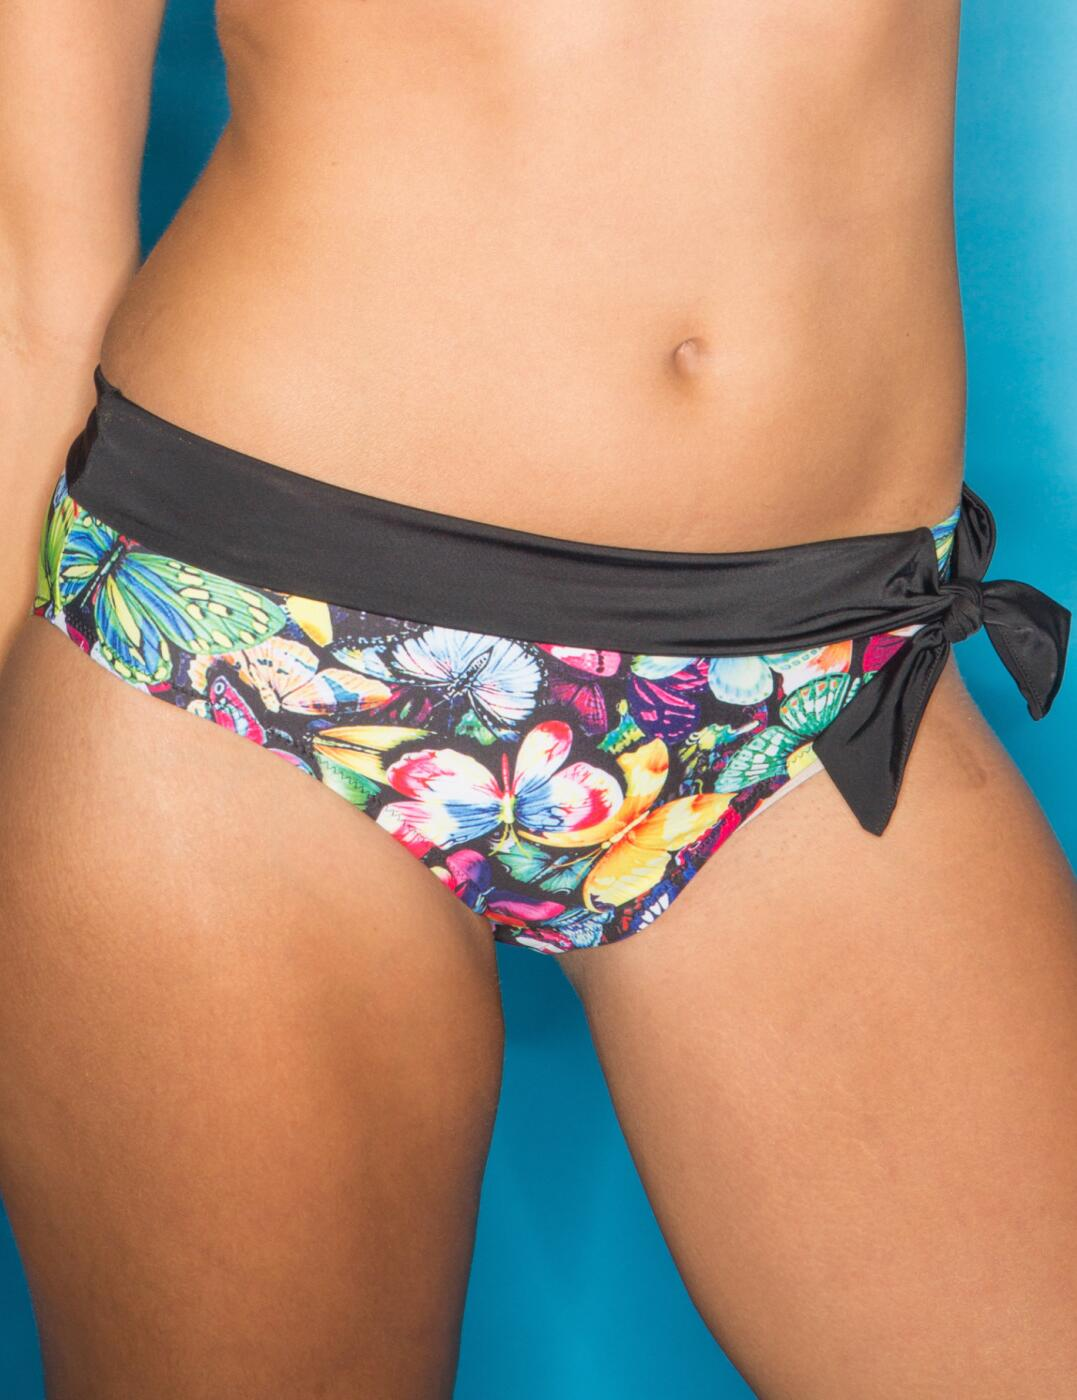 69003 Pour Moi? Copacabana Fold Tie Bikini Brief - 69003 Butterfly/Multi